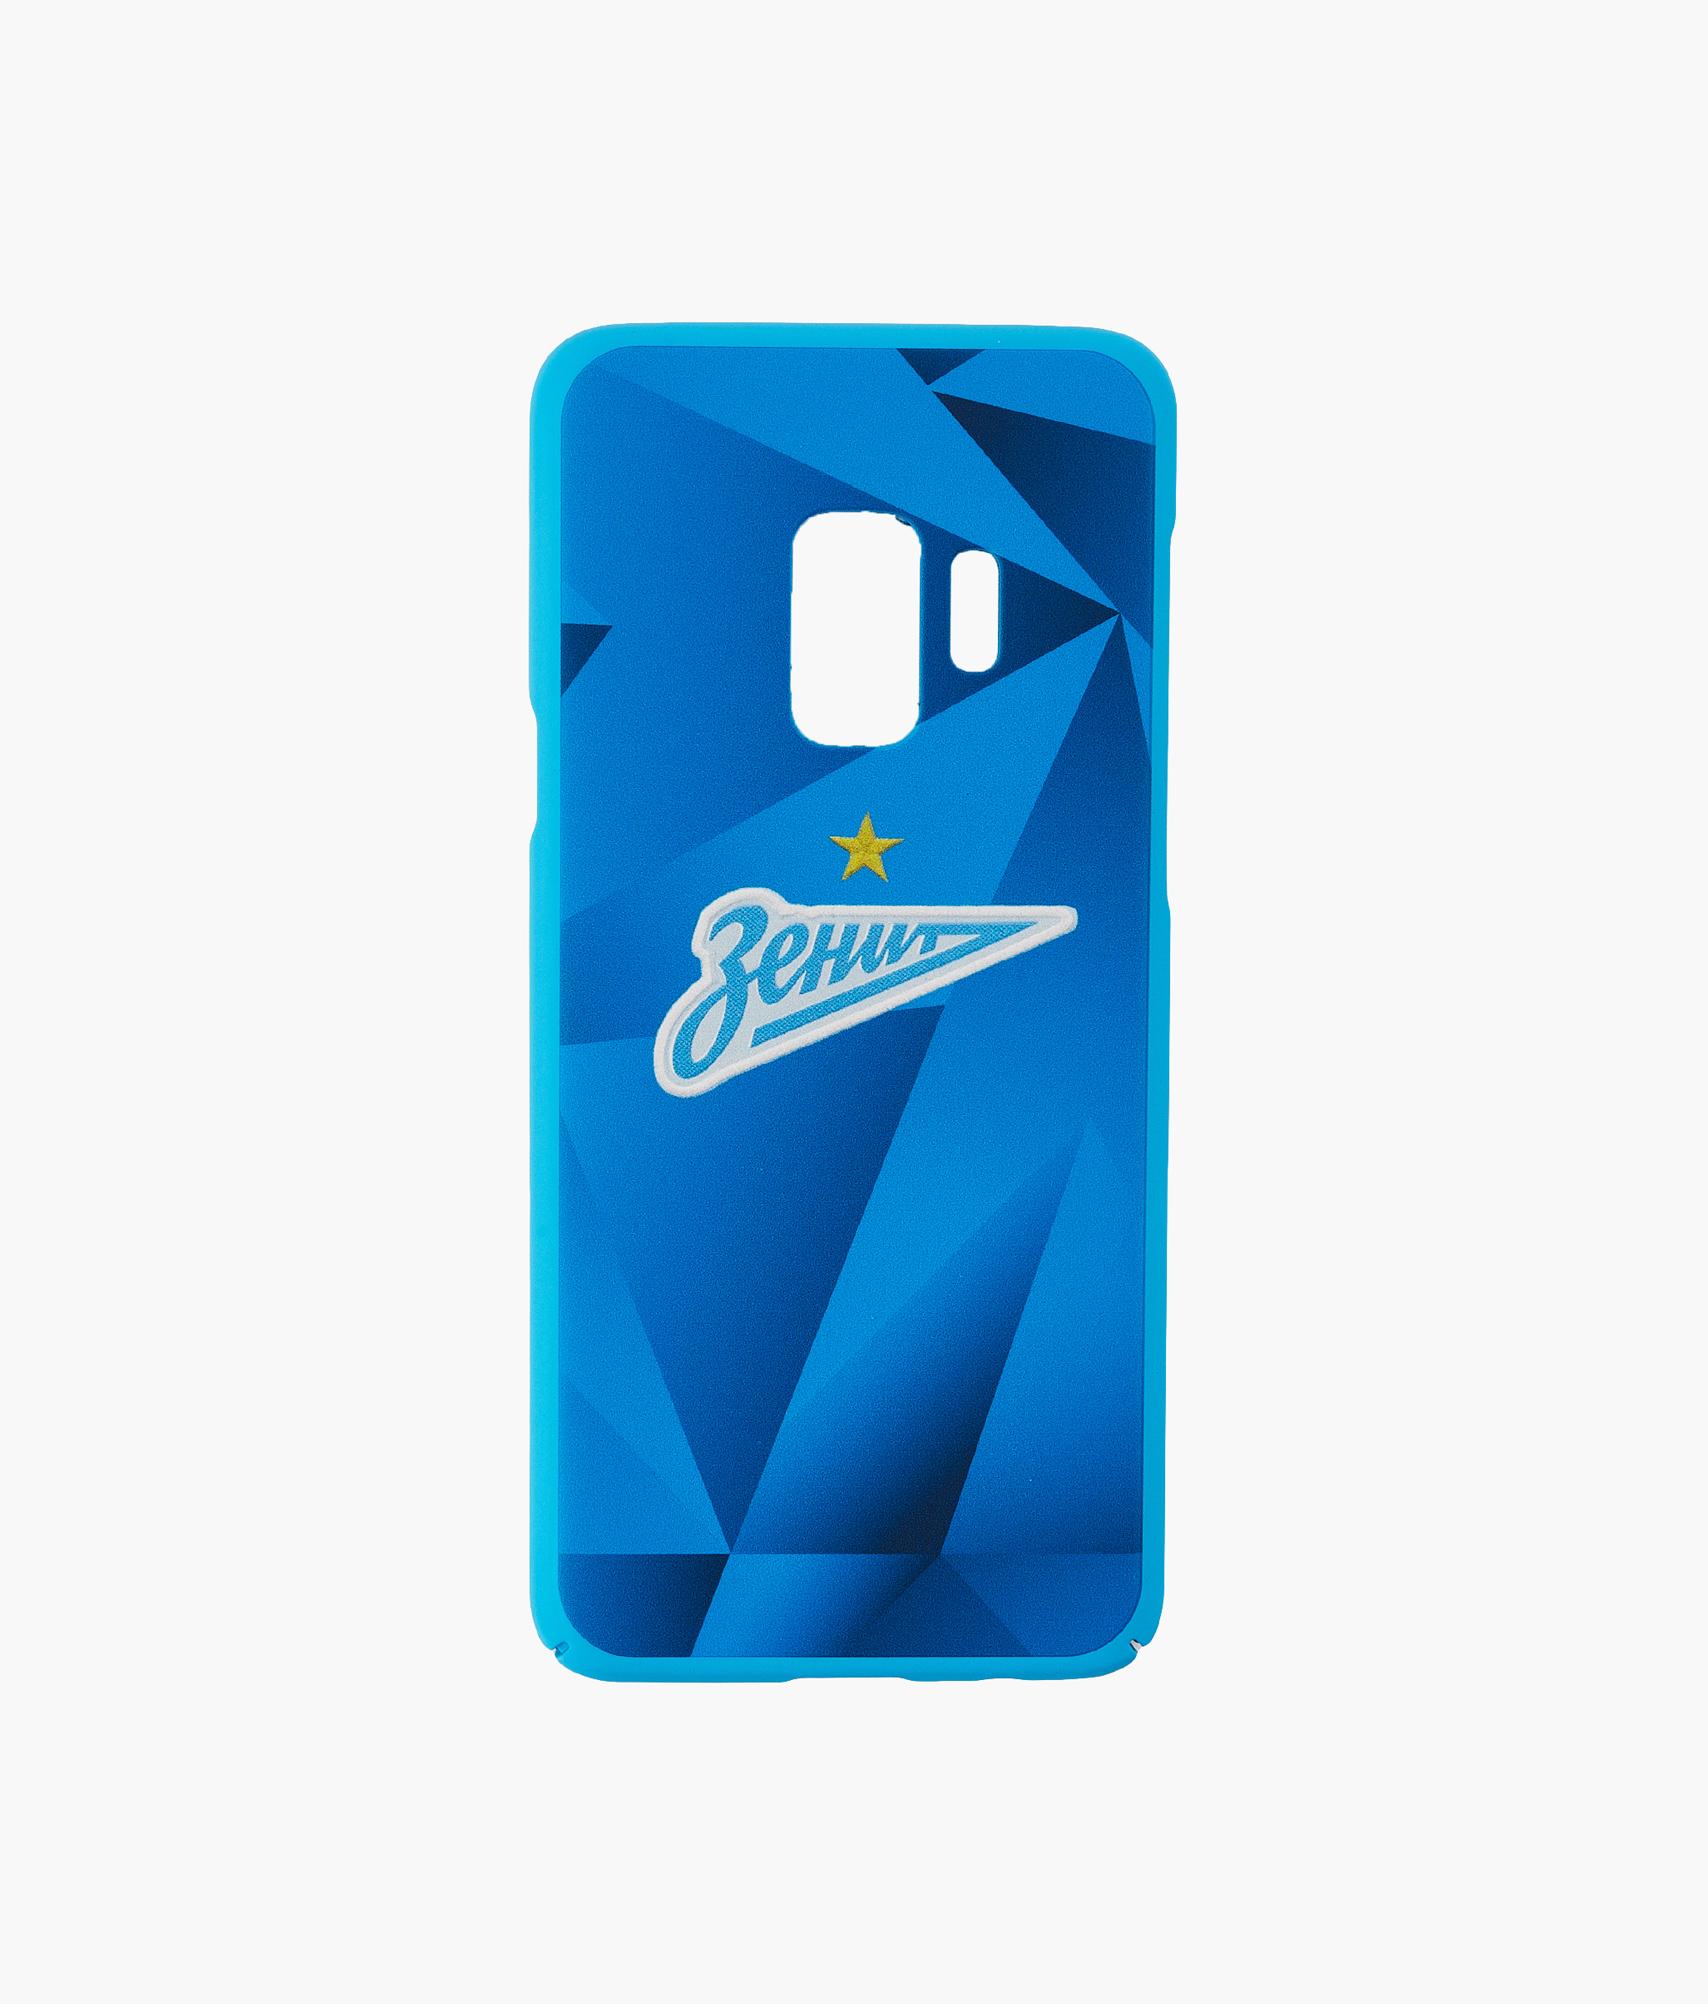 Фото - Чехол для Samsung Galaxy S9 «Форма 2019/20» Зенит Цвет-Синий чехол для сотового телефона nillkin samsung a8 2018 чехол книжка sparkle розовый